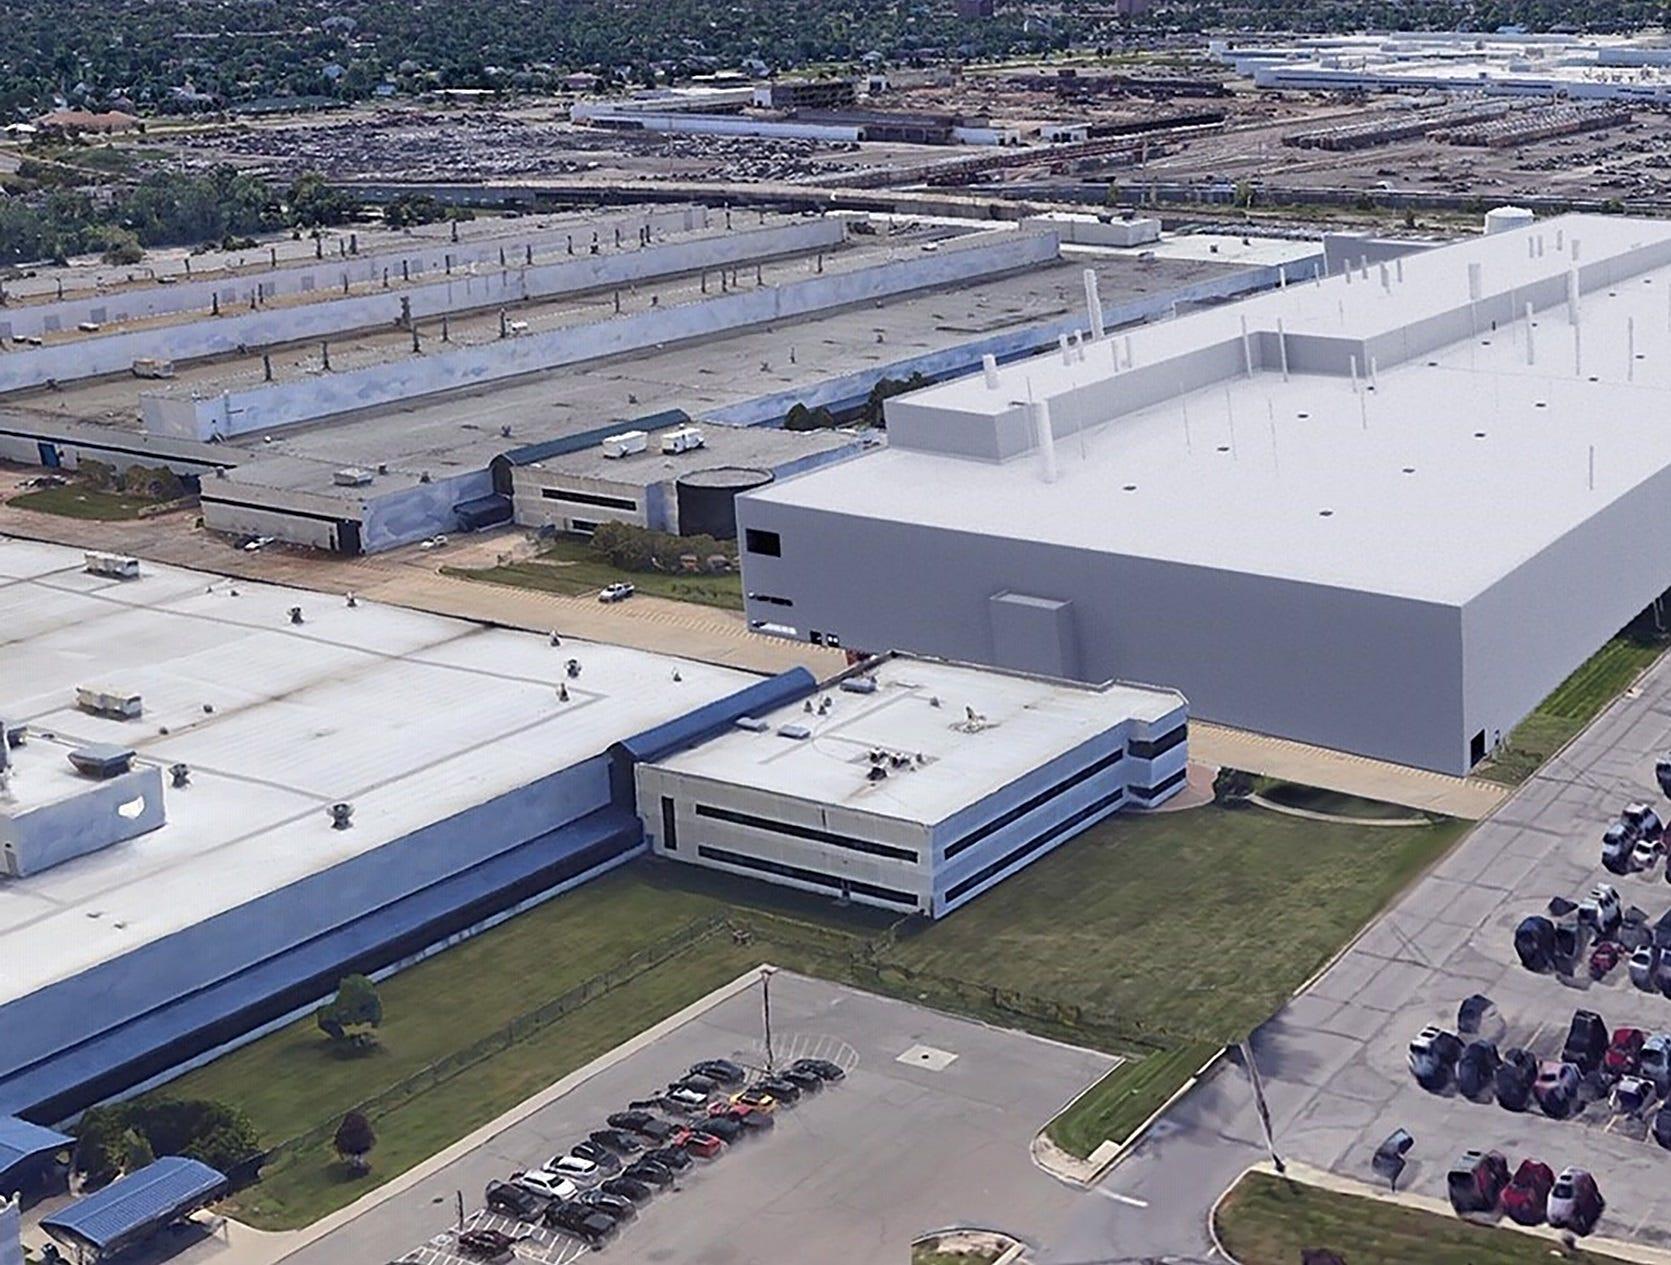 As deadline nears, Detroit Jeep plant hopes hinge on Morouns